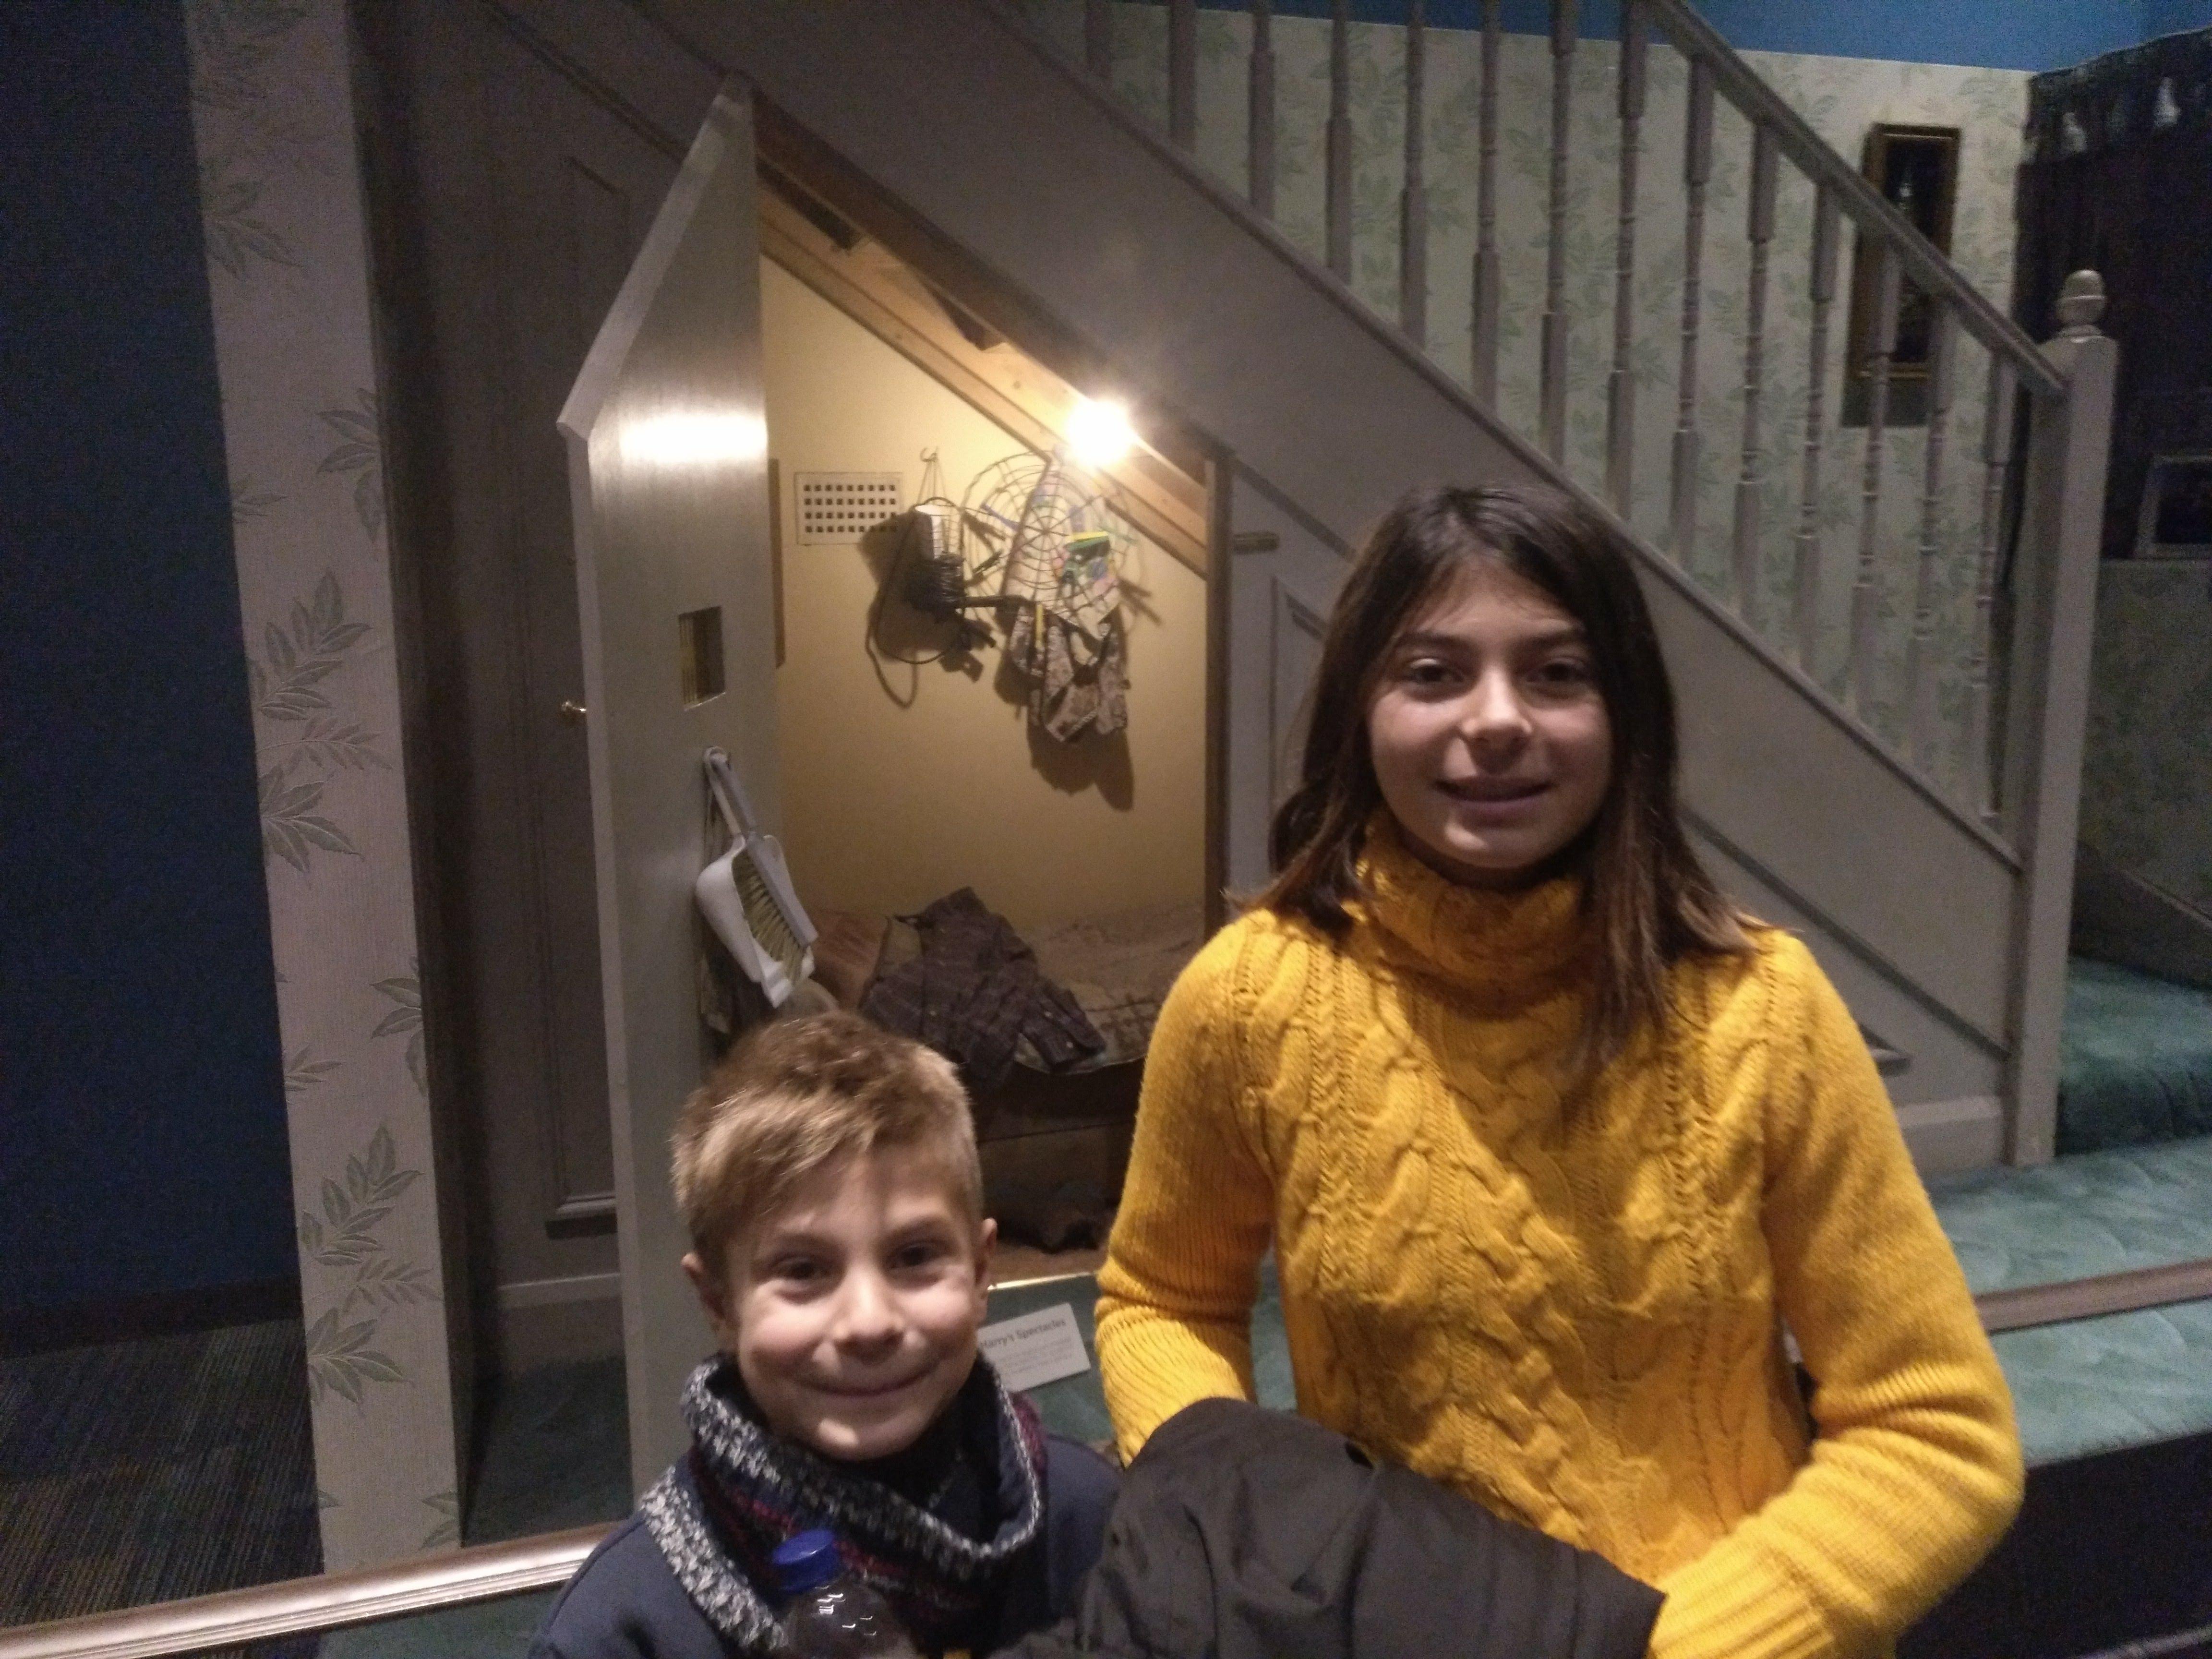 harry potter studios - escalera - niños - buhardilla